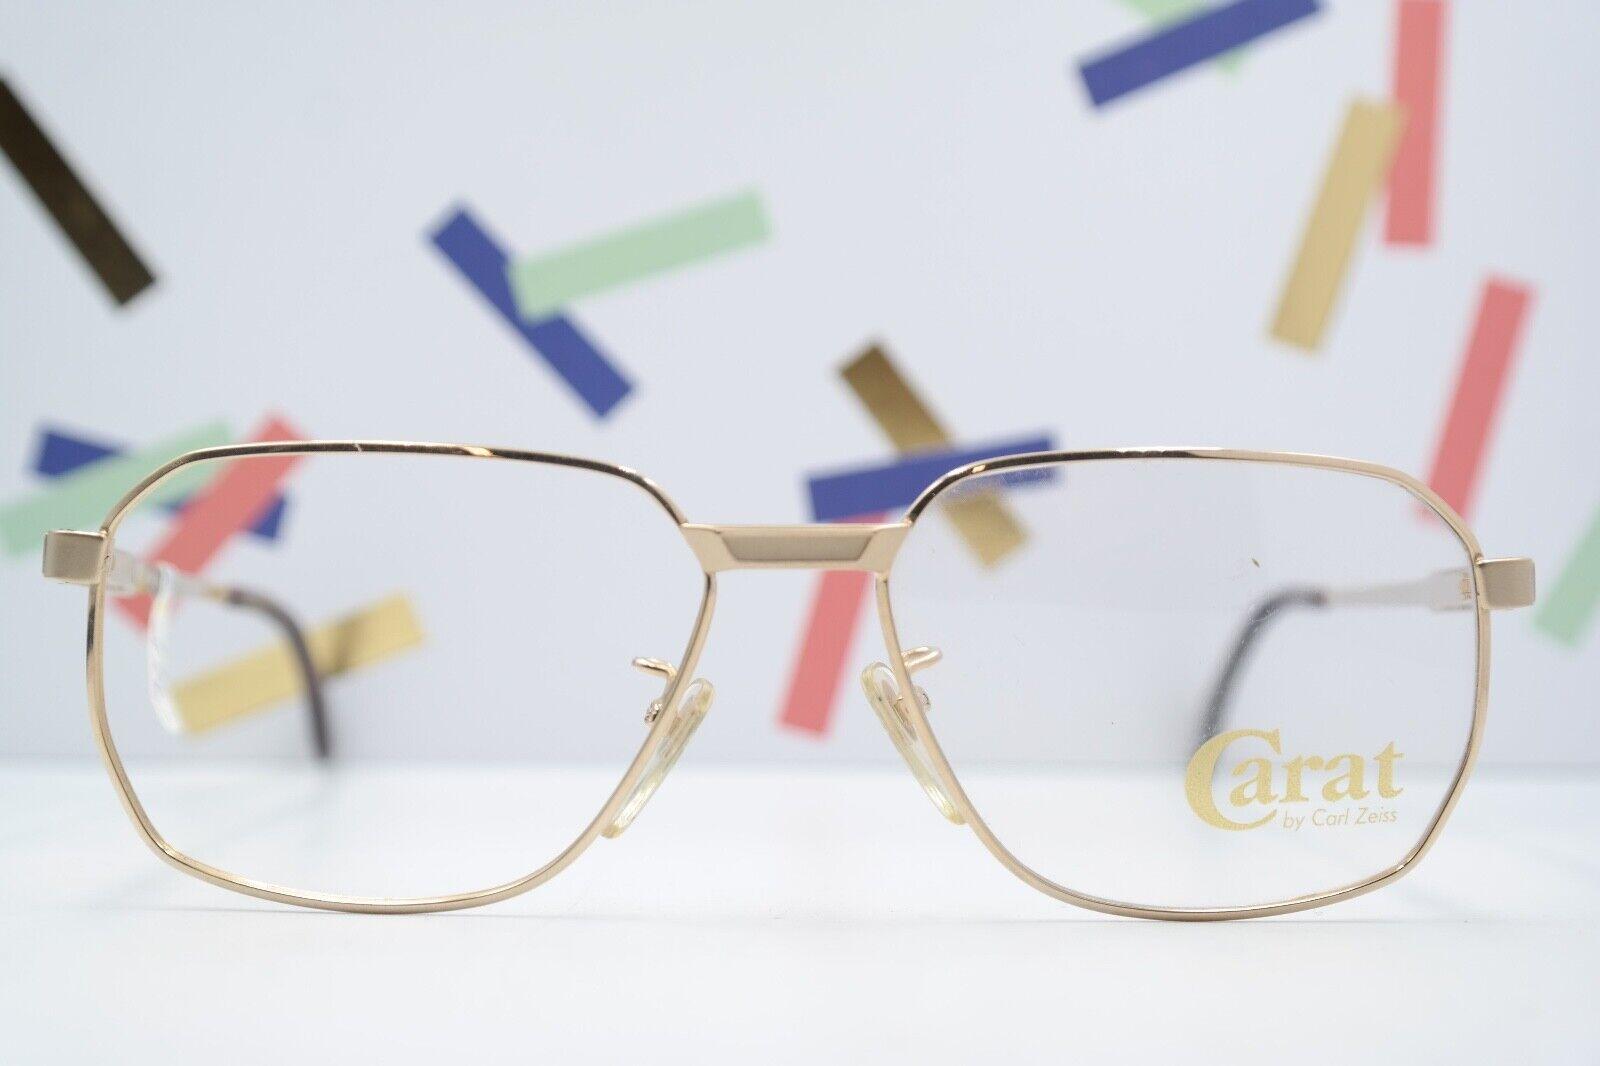 Brille Brillengestell Vintage Carat by Zeiss A5996 4001 gold 80s 54/15 135 NOS